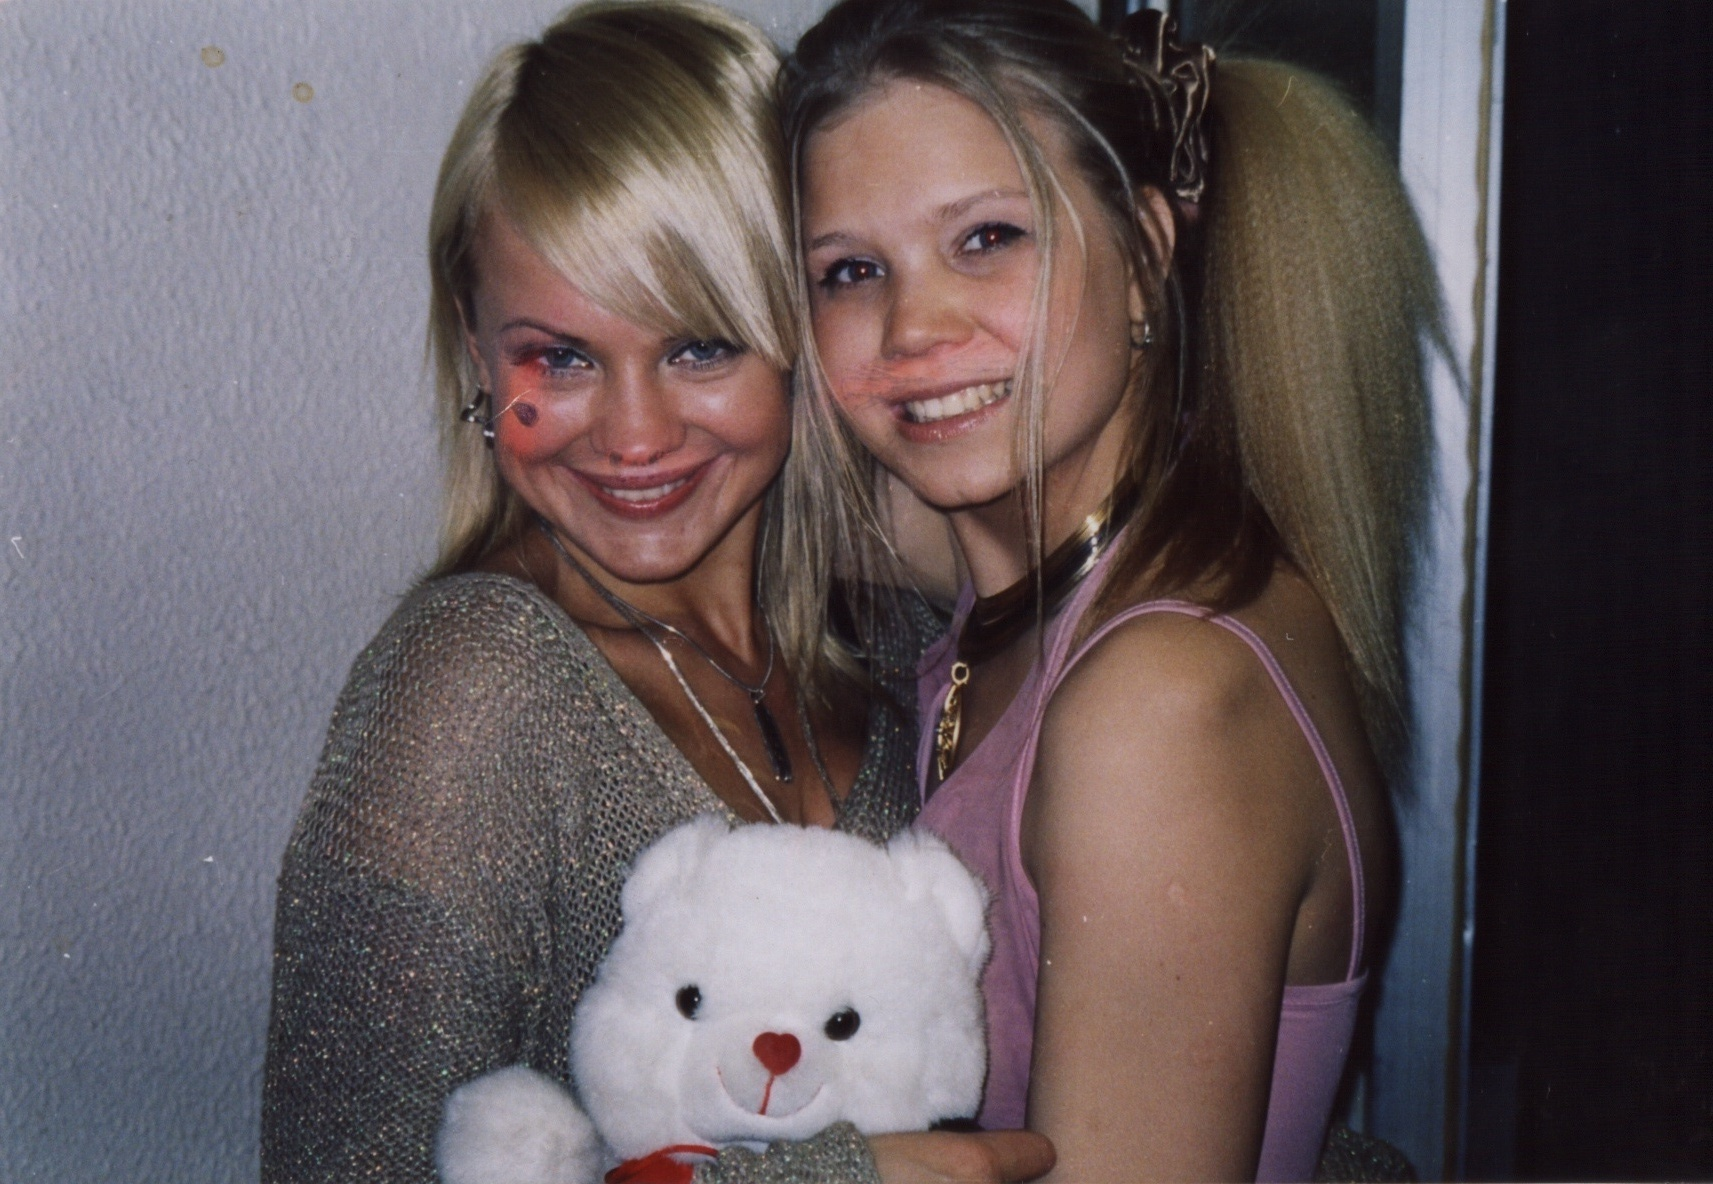 Алла Михеева (справа) и солистка группы «Тутси» Ирина Ортман